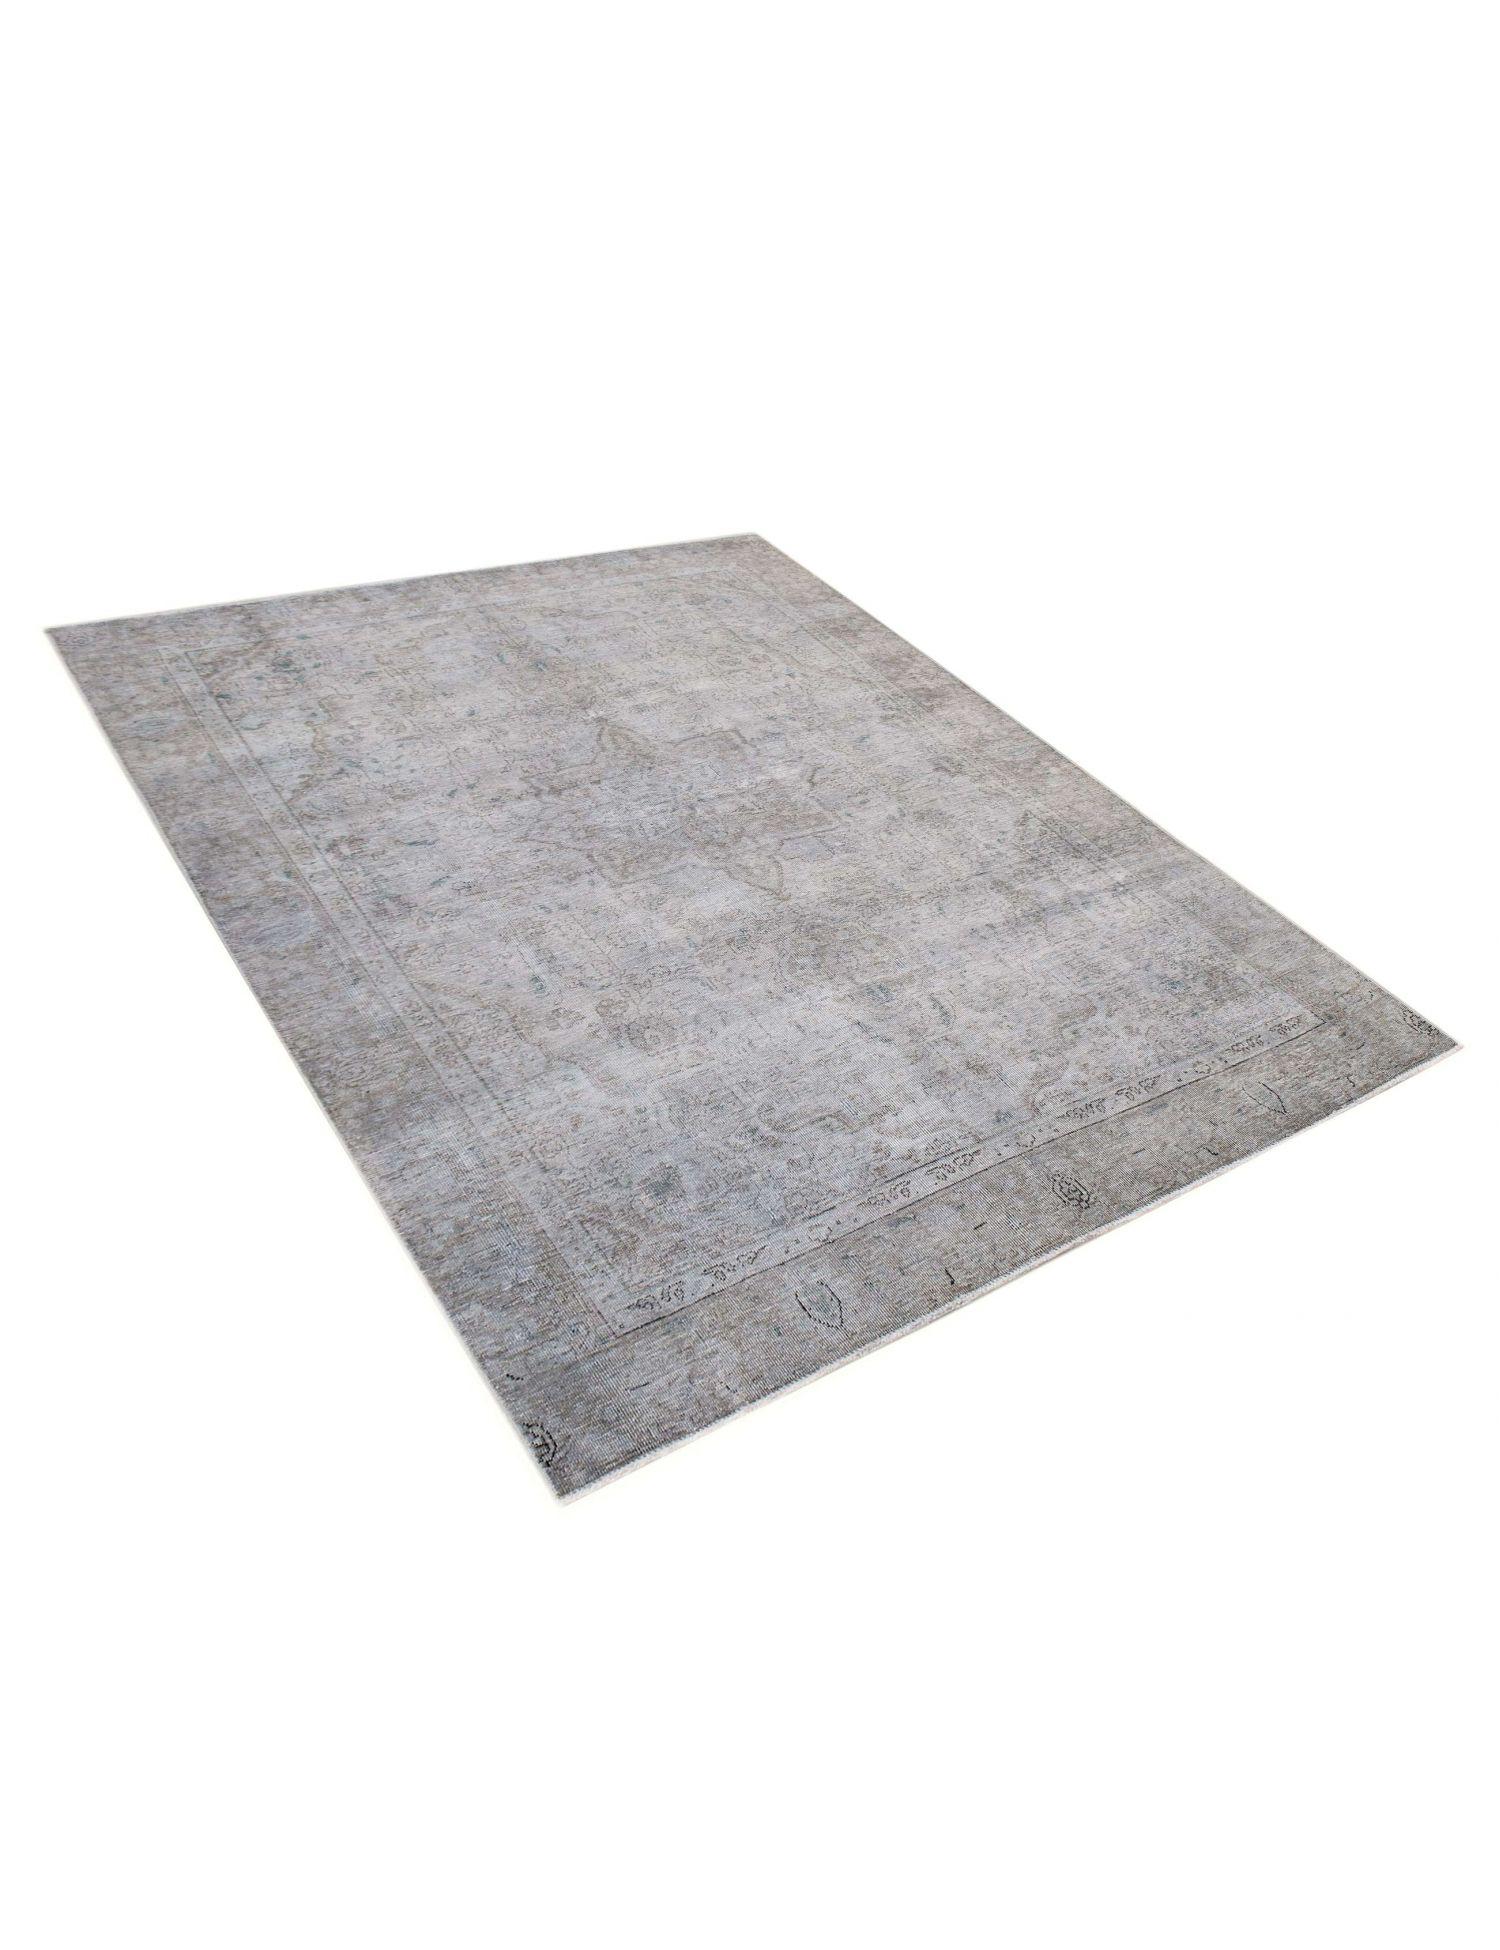 Vintage Perserteppich  grau <br/>263 x 191 cm